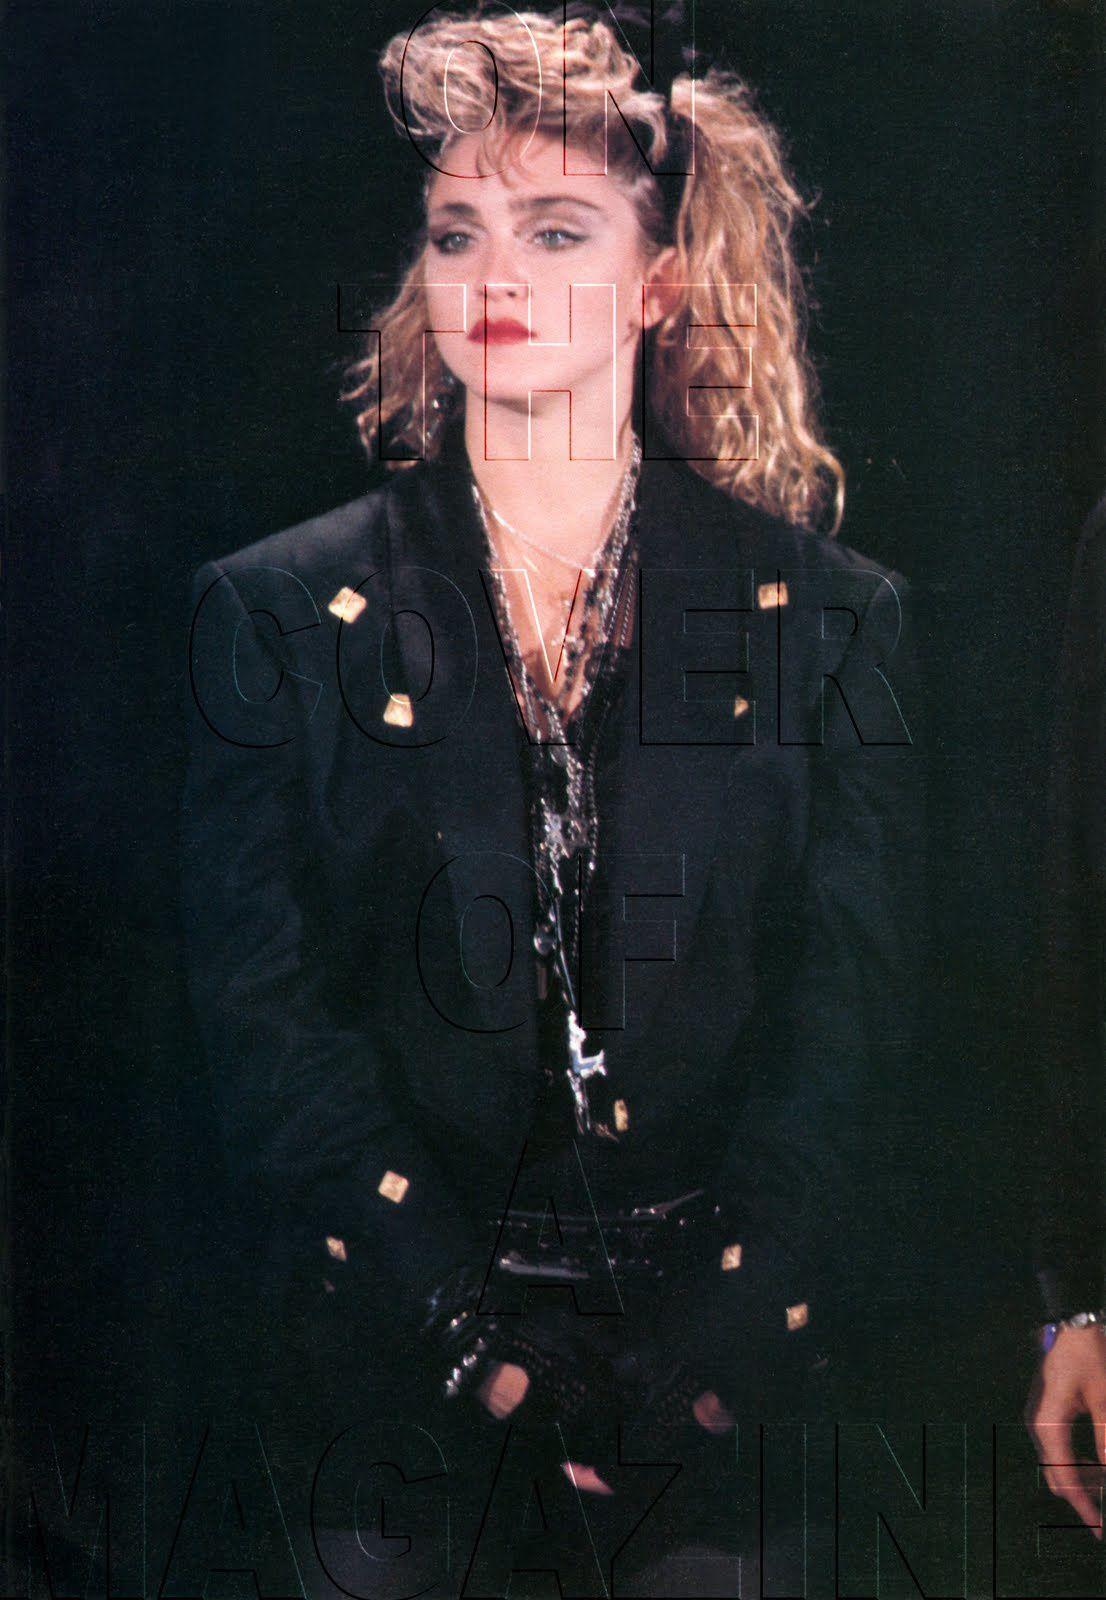 Madonna Vintage Concert Tour T-shirt - Madonna The Virgin